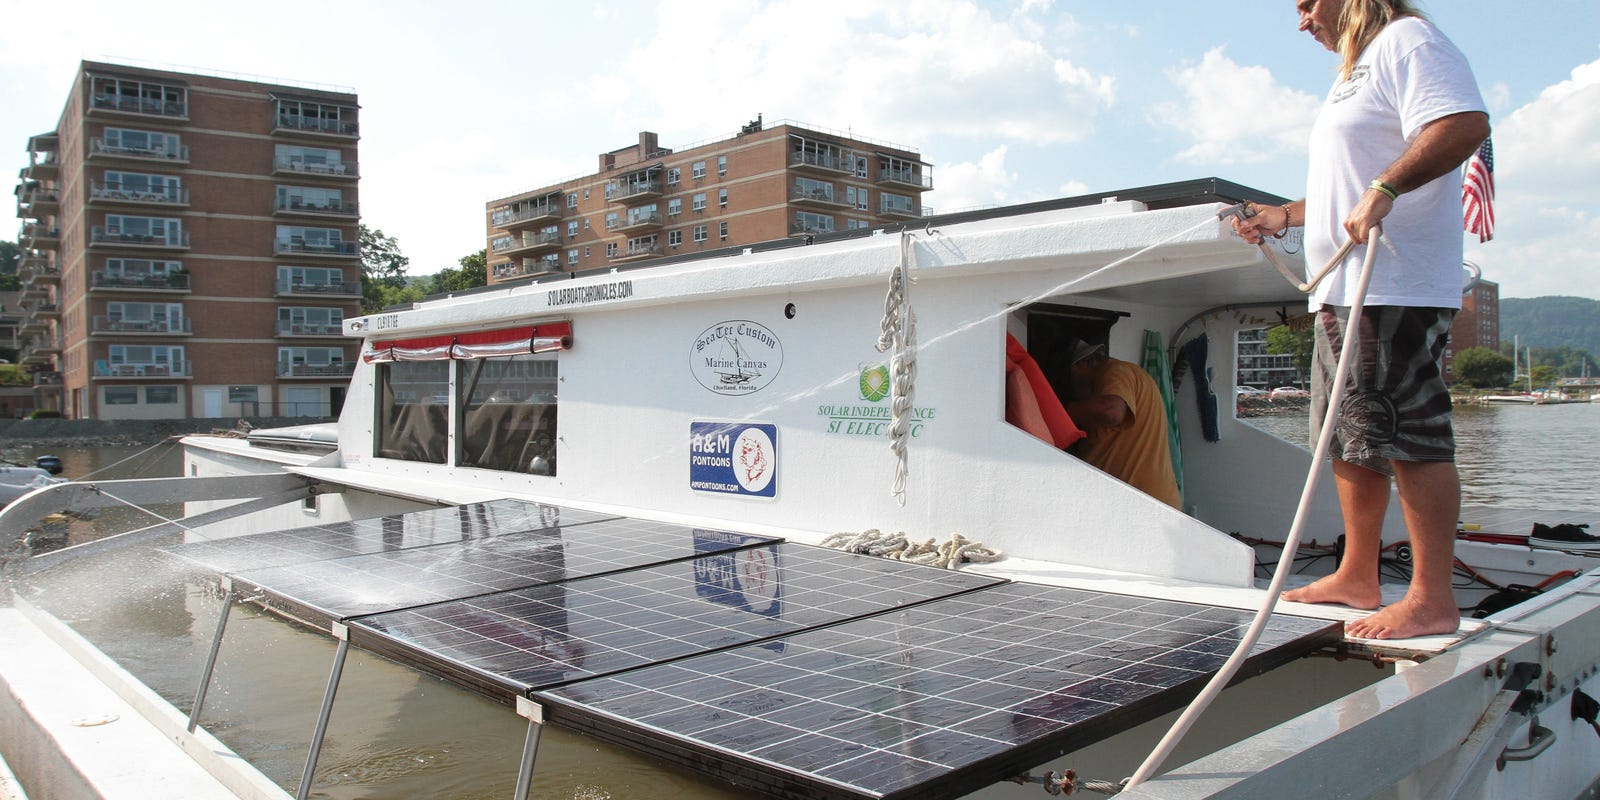 Marine solar panel installations first mate marine inc - Marine Solar Panel Installations First Mate Marine Inc 19